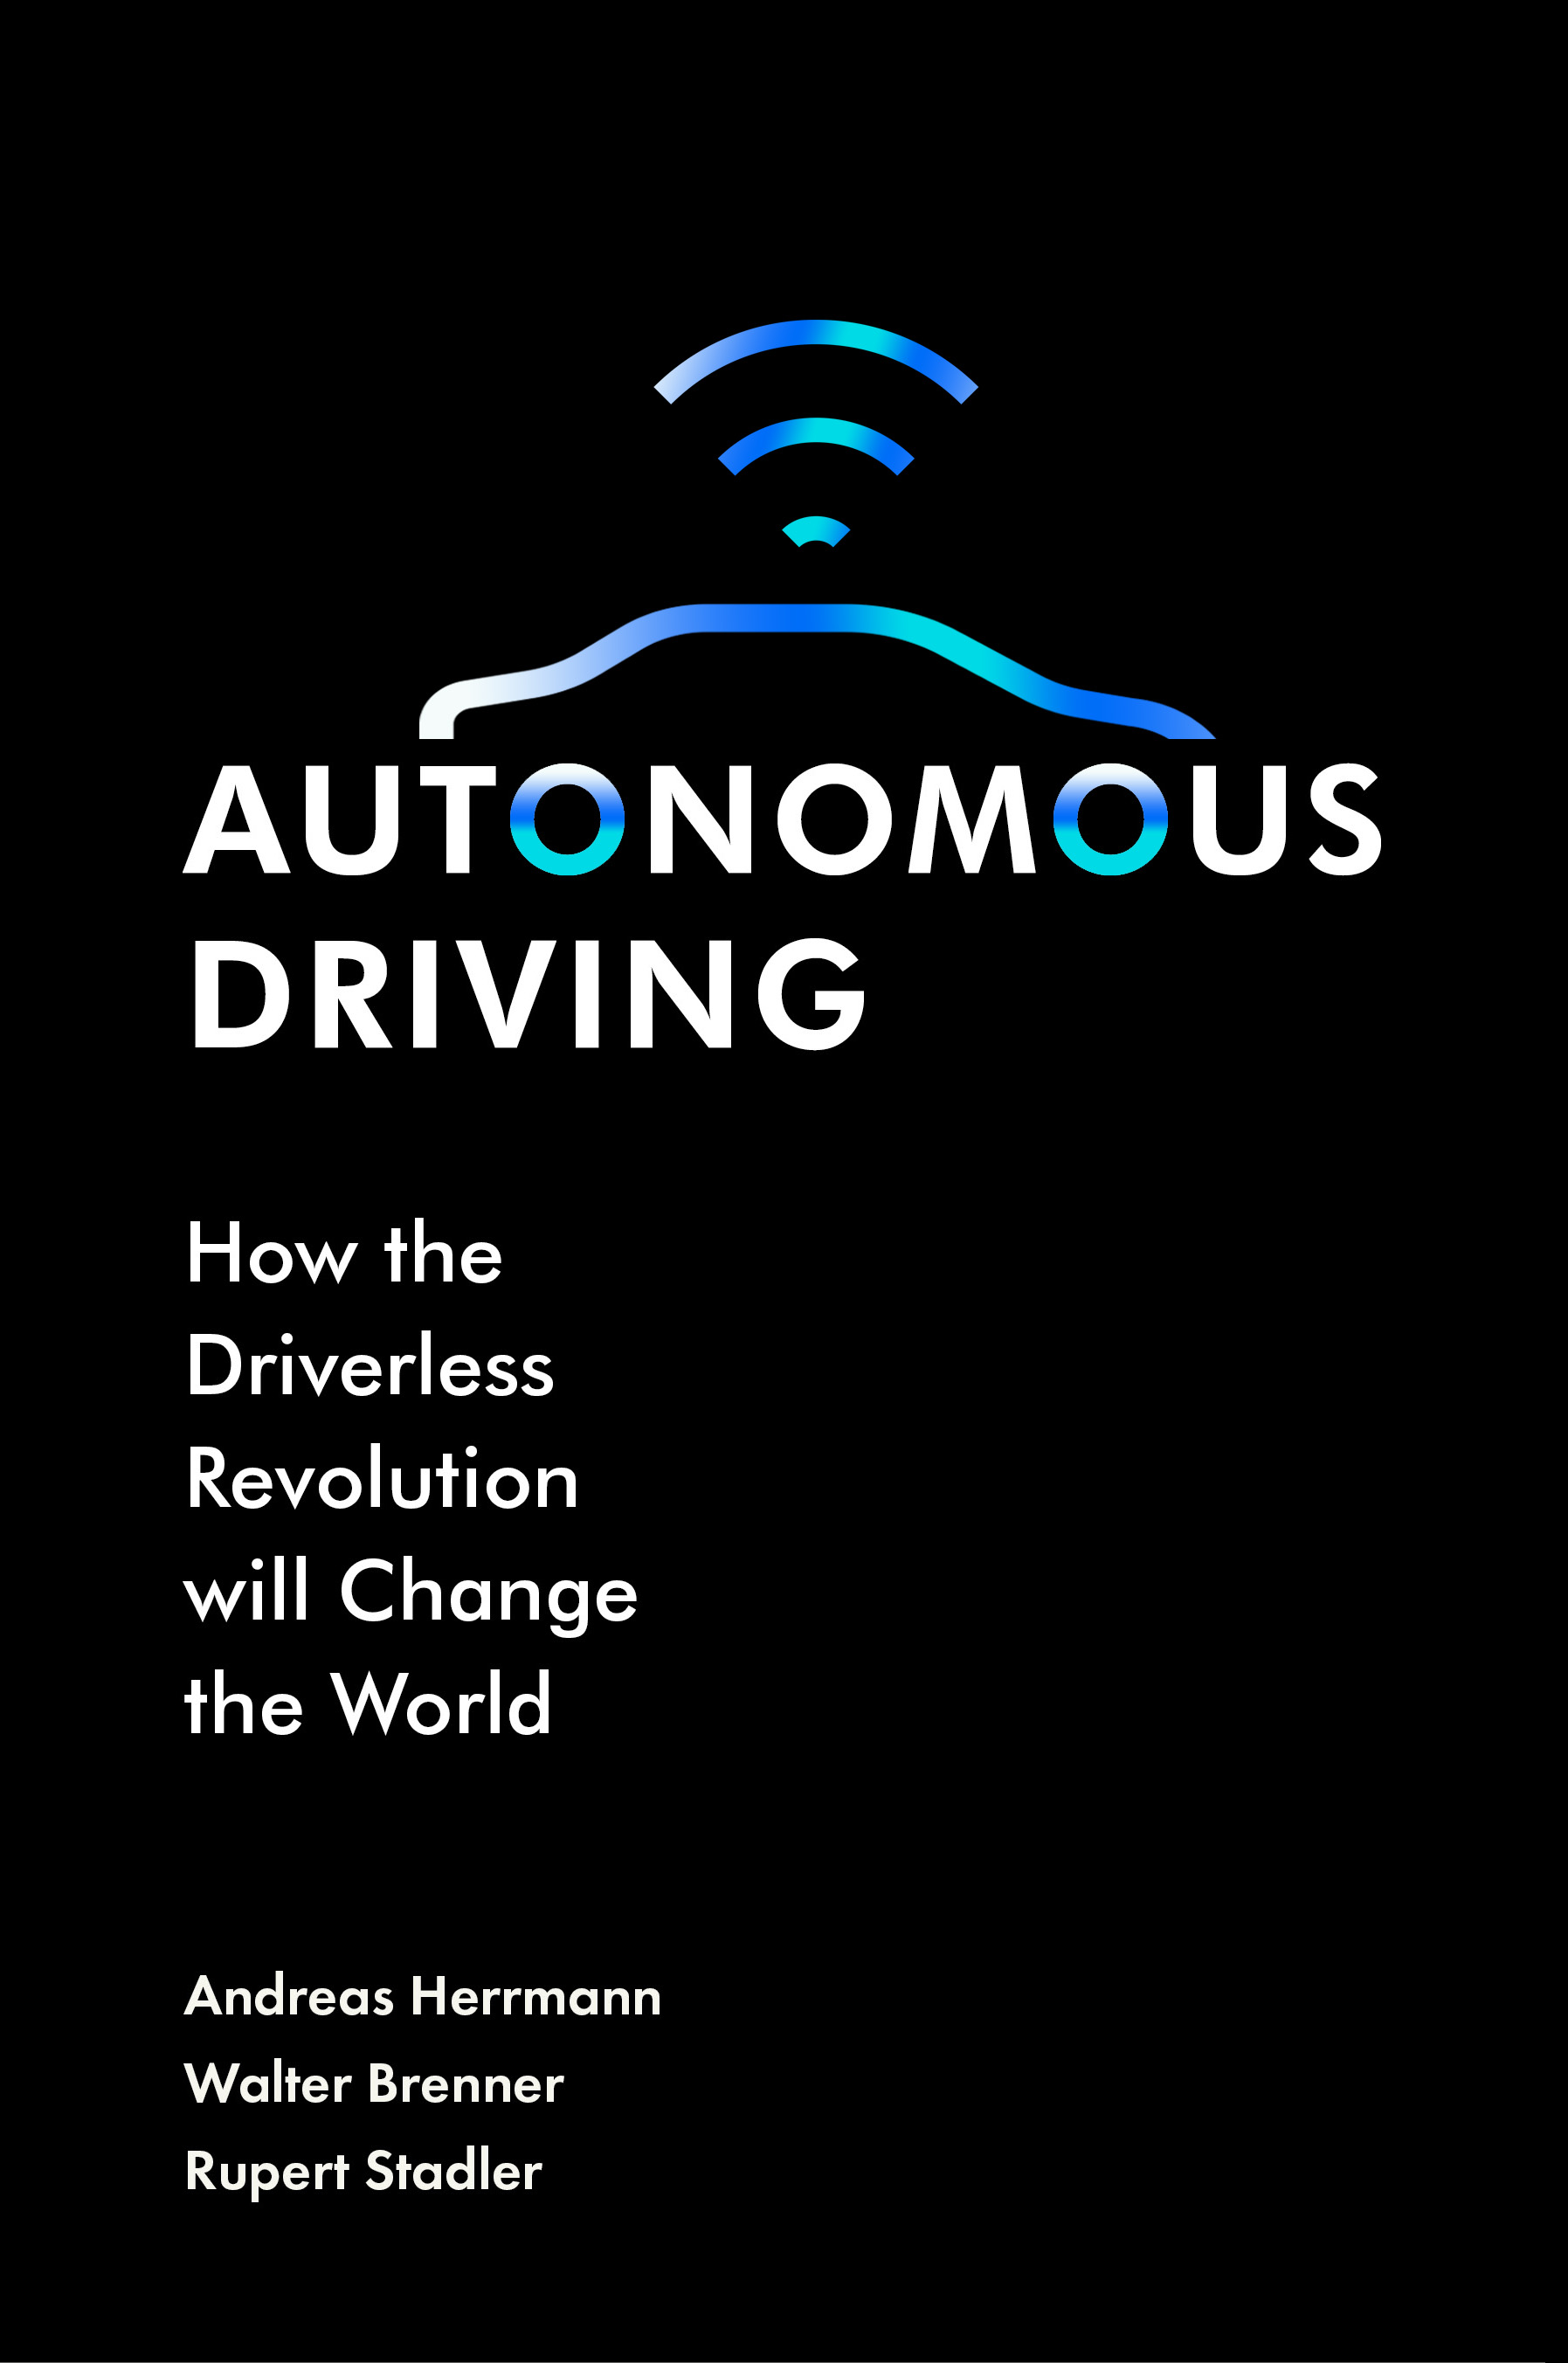 IRT Group driverless pod zero from Aurrigo